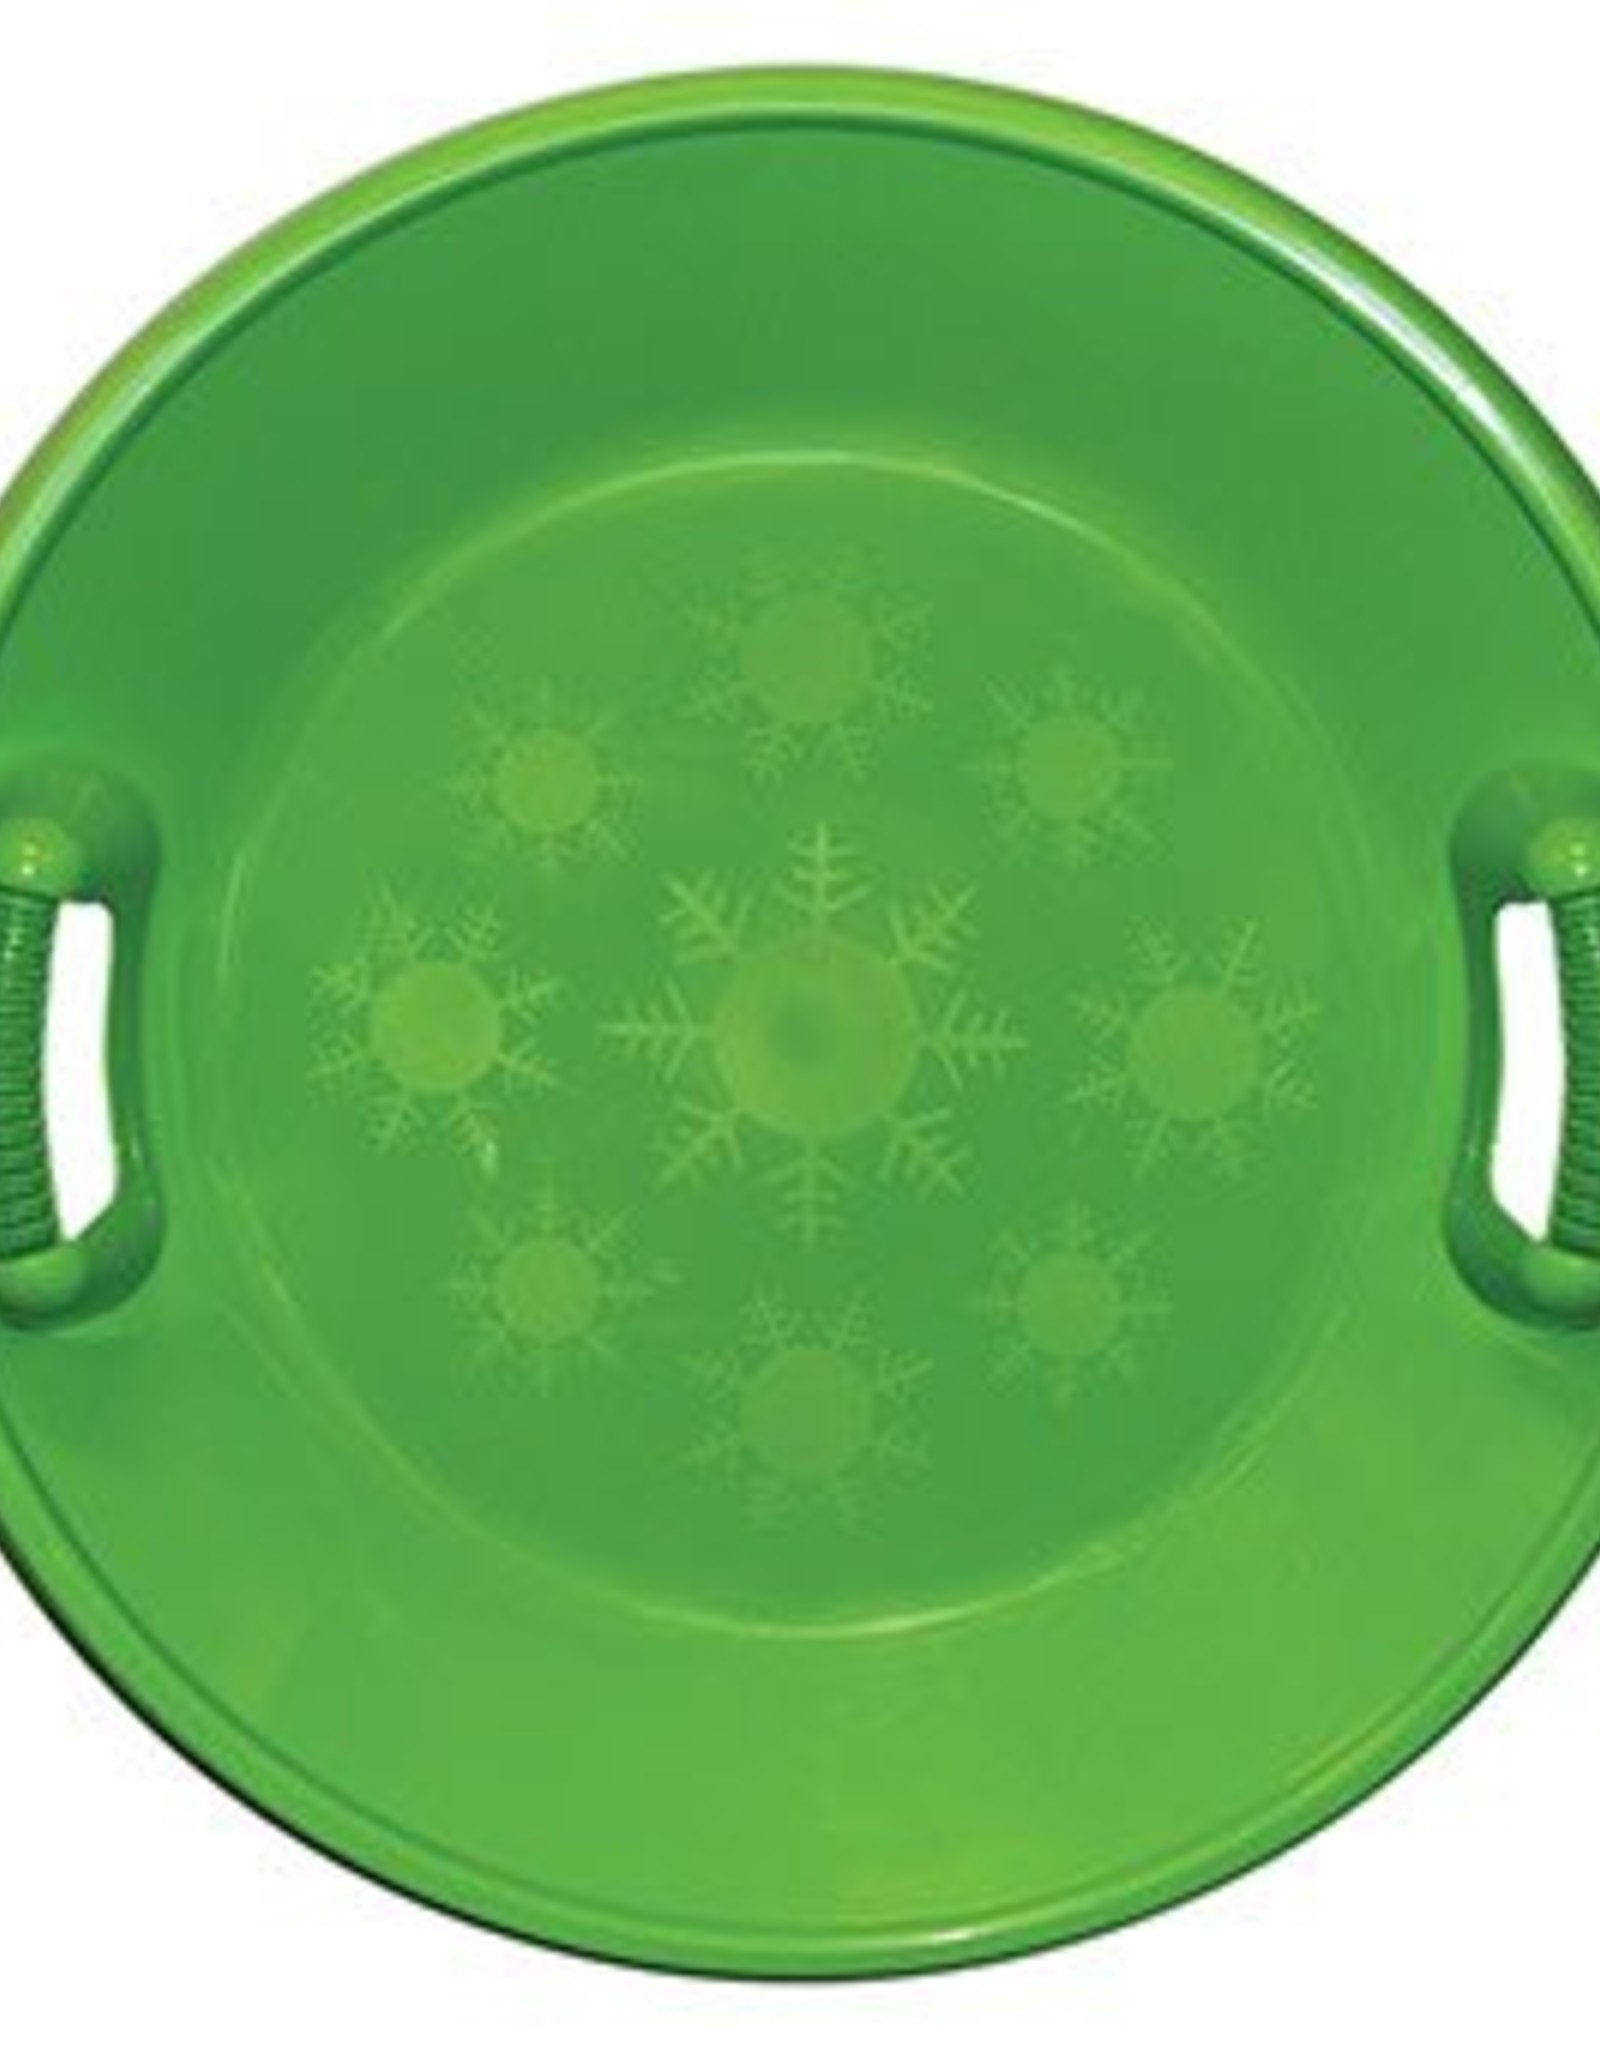 Airhead Plastic Saucer Sled